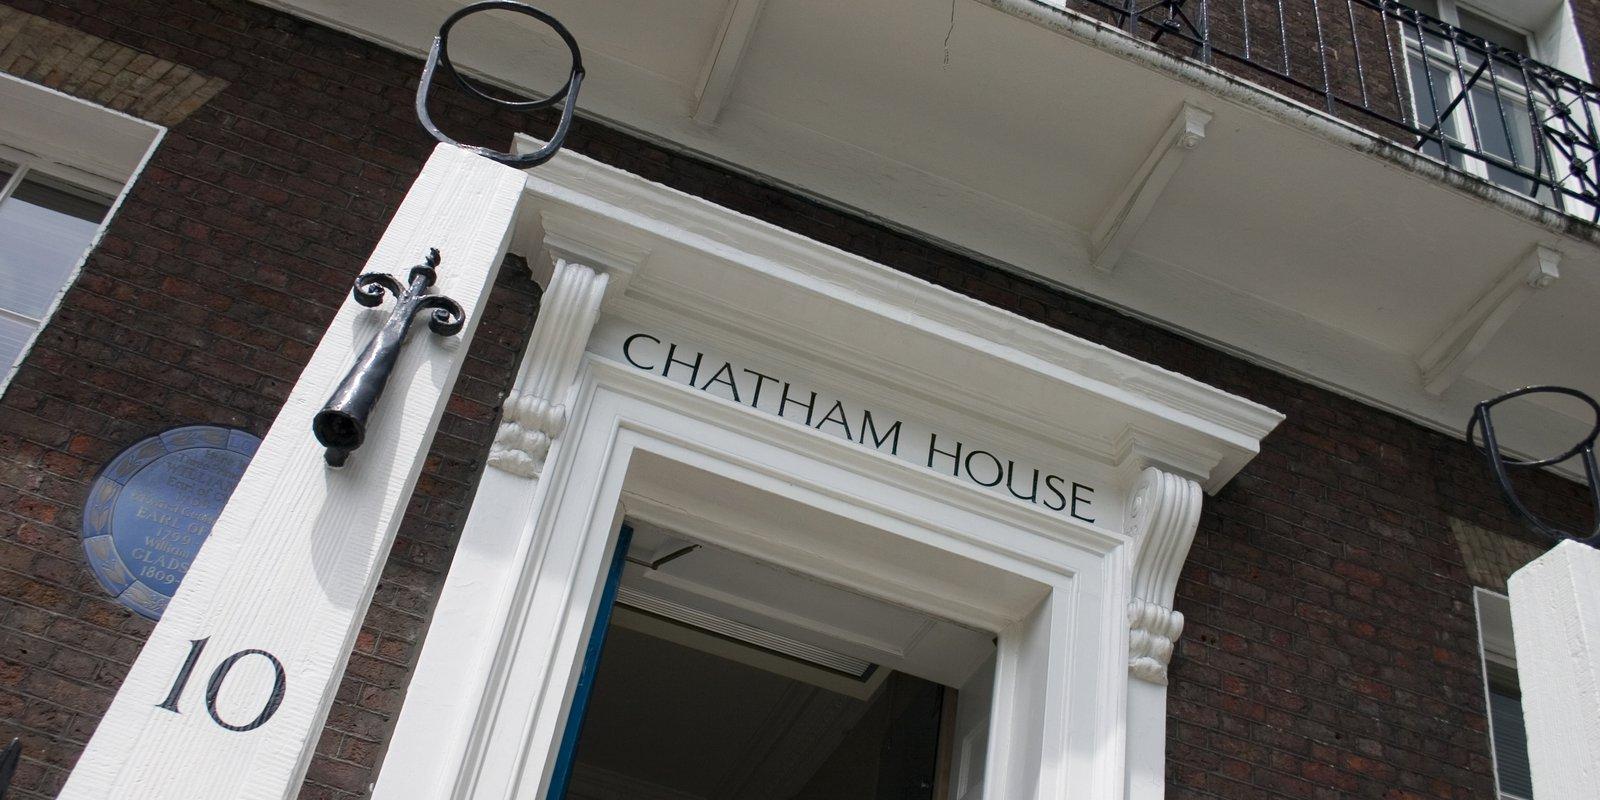 Chatham House circa2016.